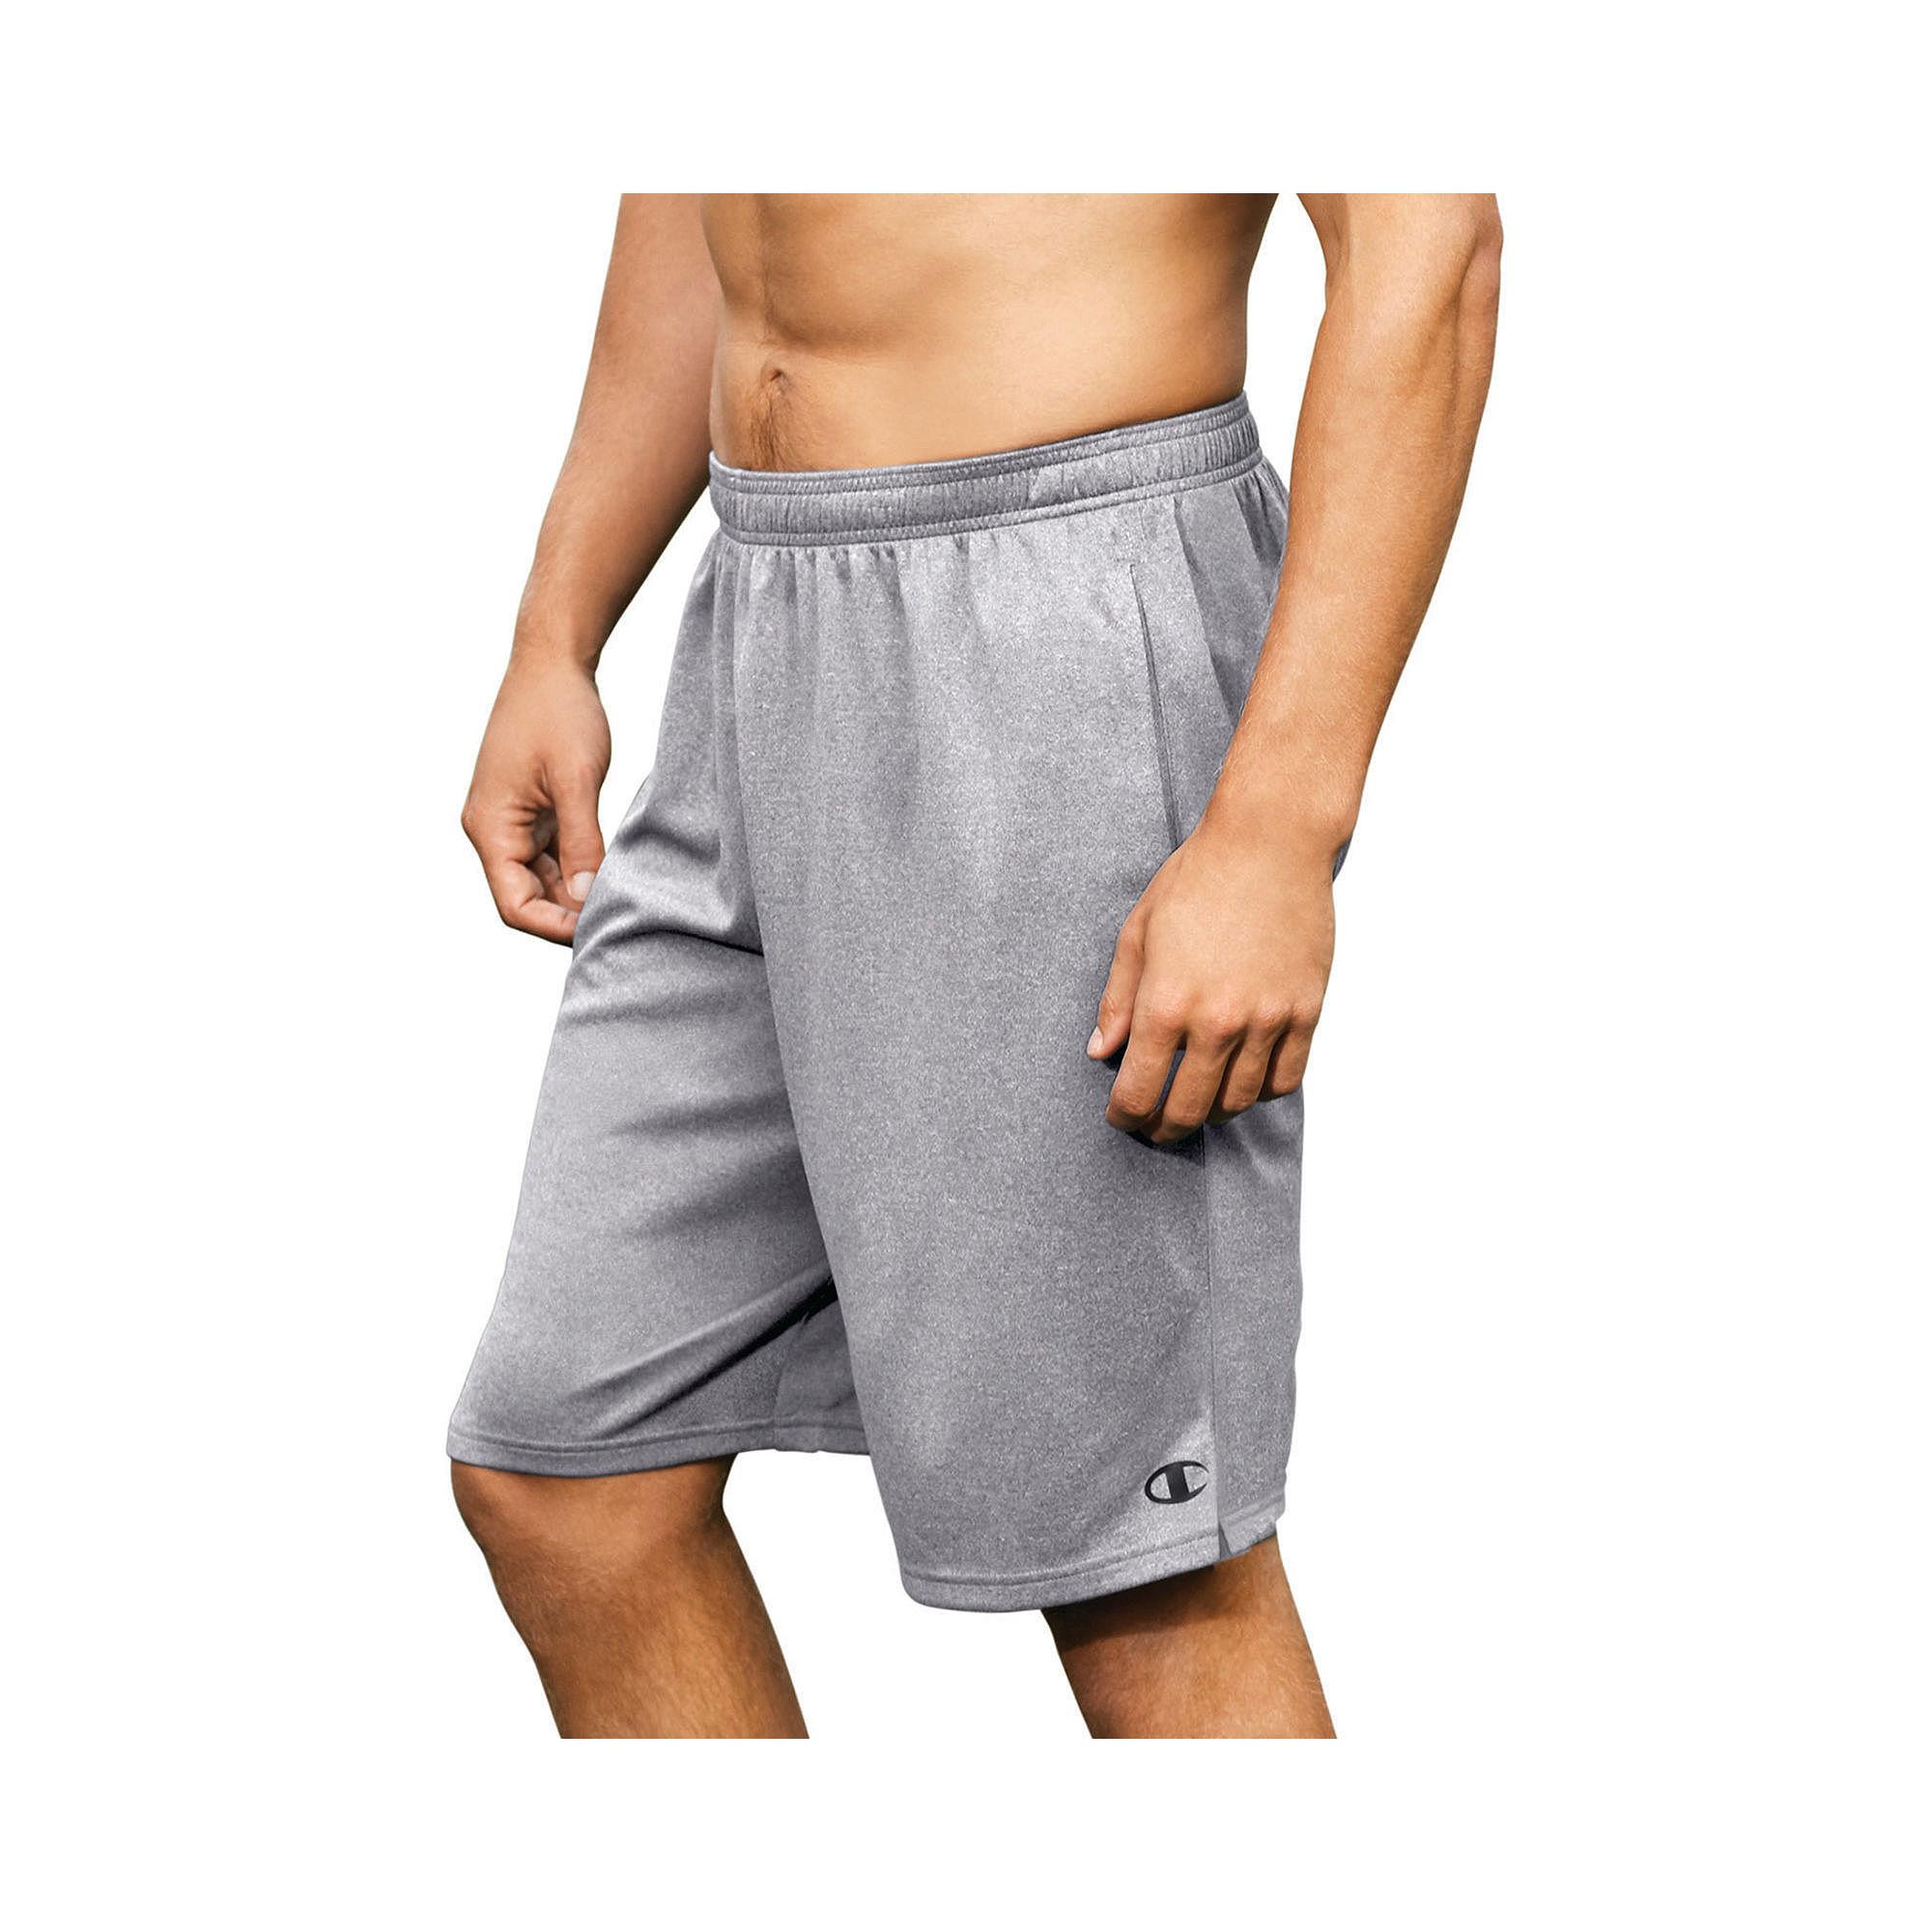 2b1b4a46 ... UPC 078715934286 product image for Champion Core Training Compression  Shorts | upcitemdb.com